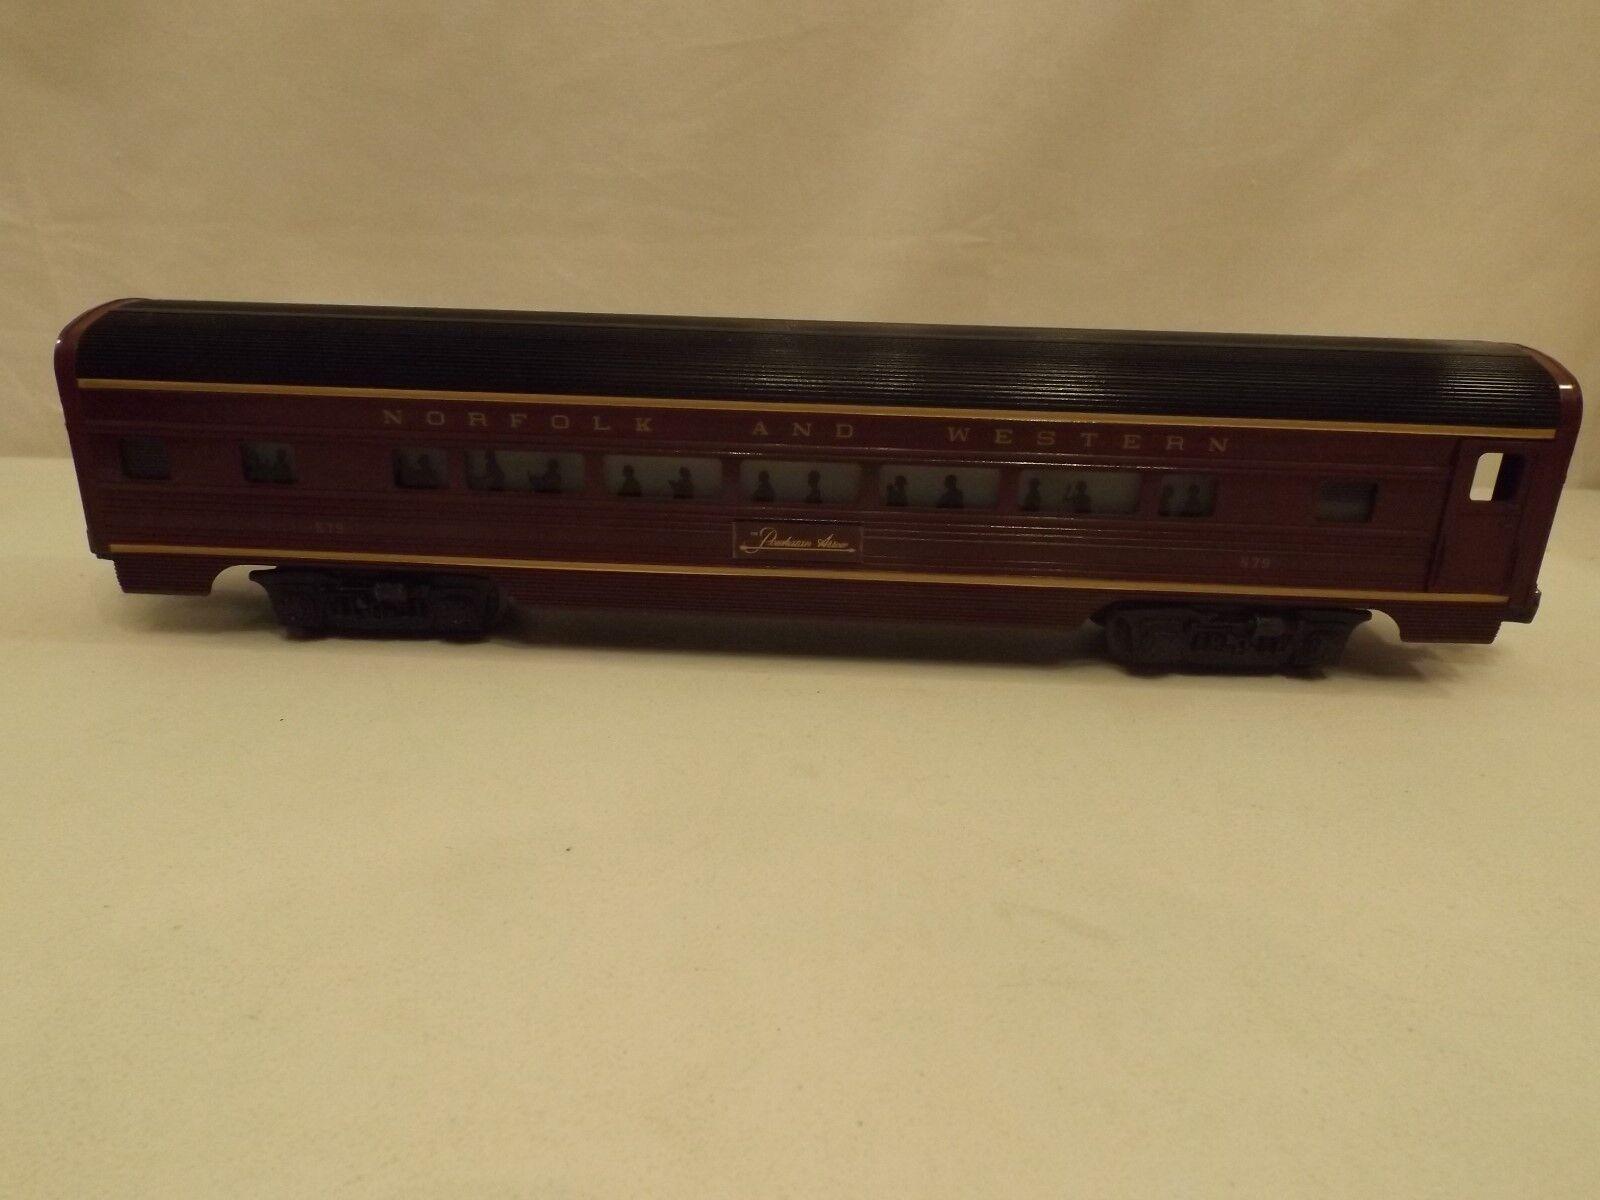 O Lionel  9564 Norfolk & Western passenger car in original box